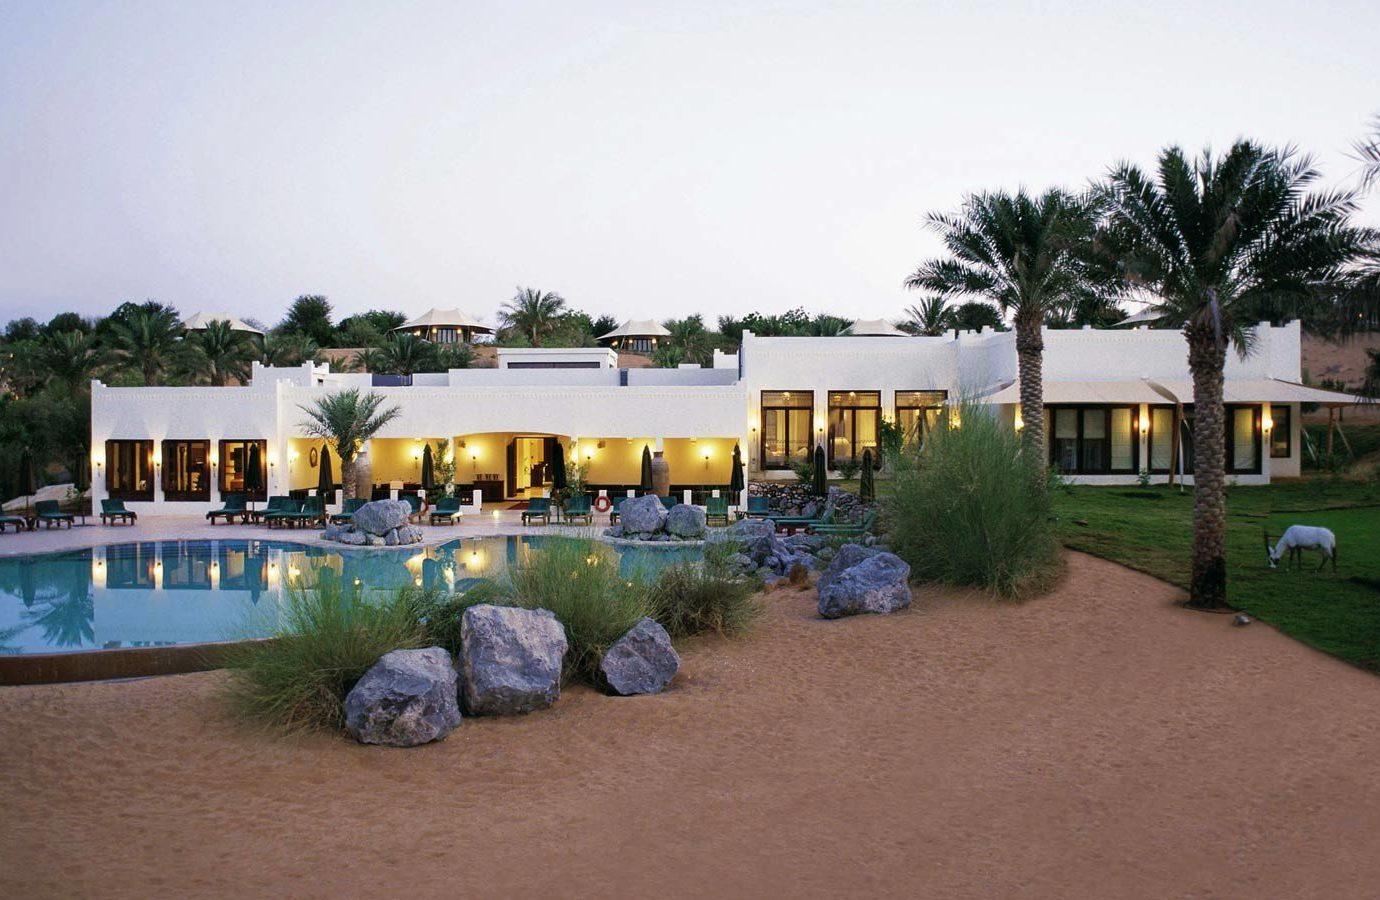 Dubai Hotels Luxury Travel Middle East Resort property home estate real estate Villa leisure house swimming pool hotel hacienda cottage